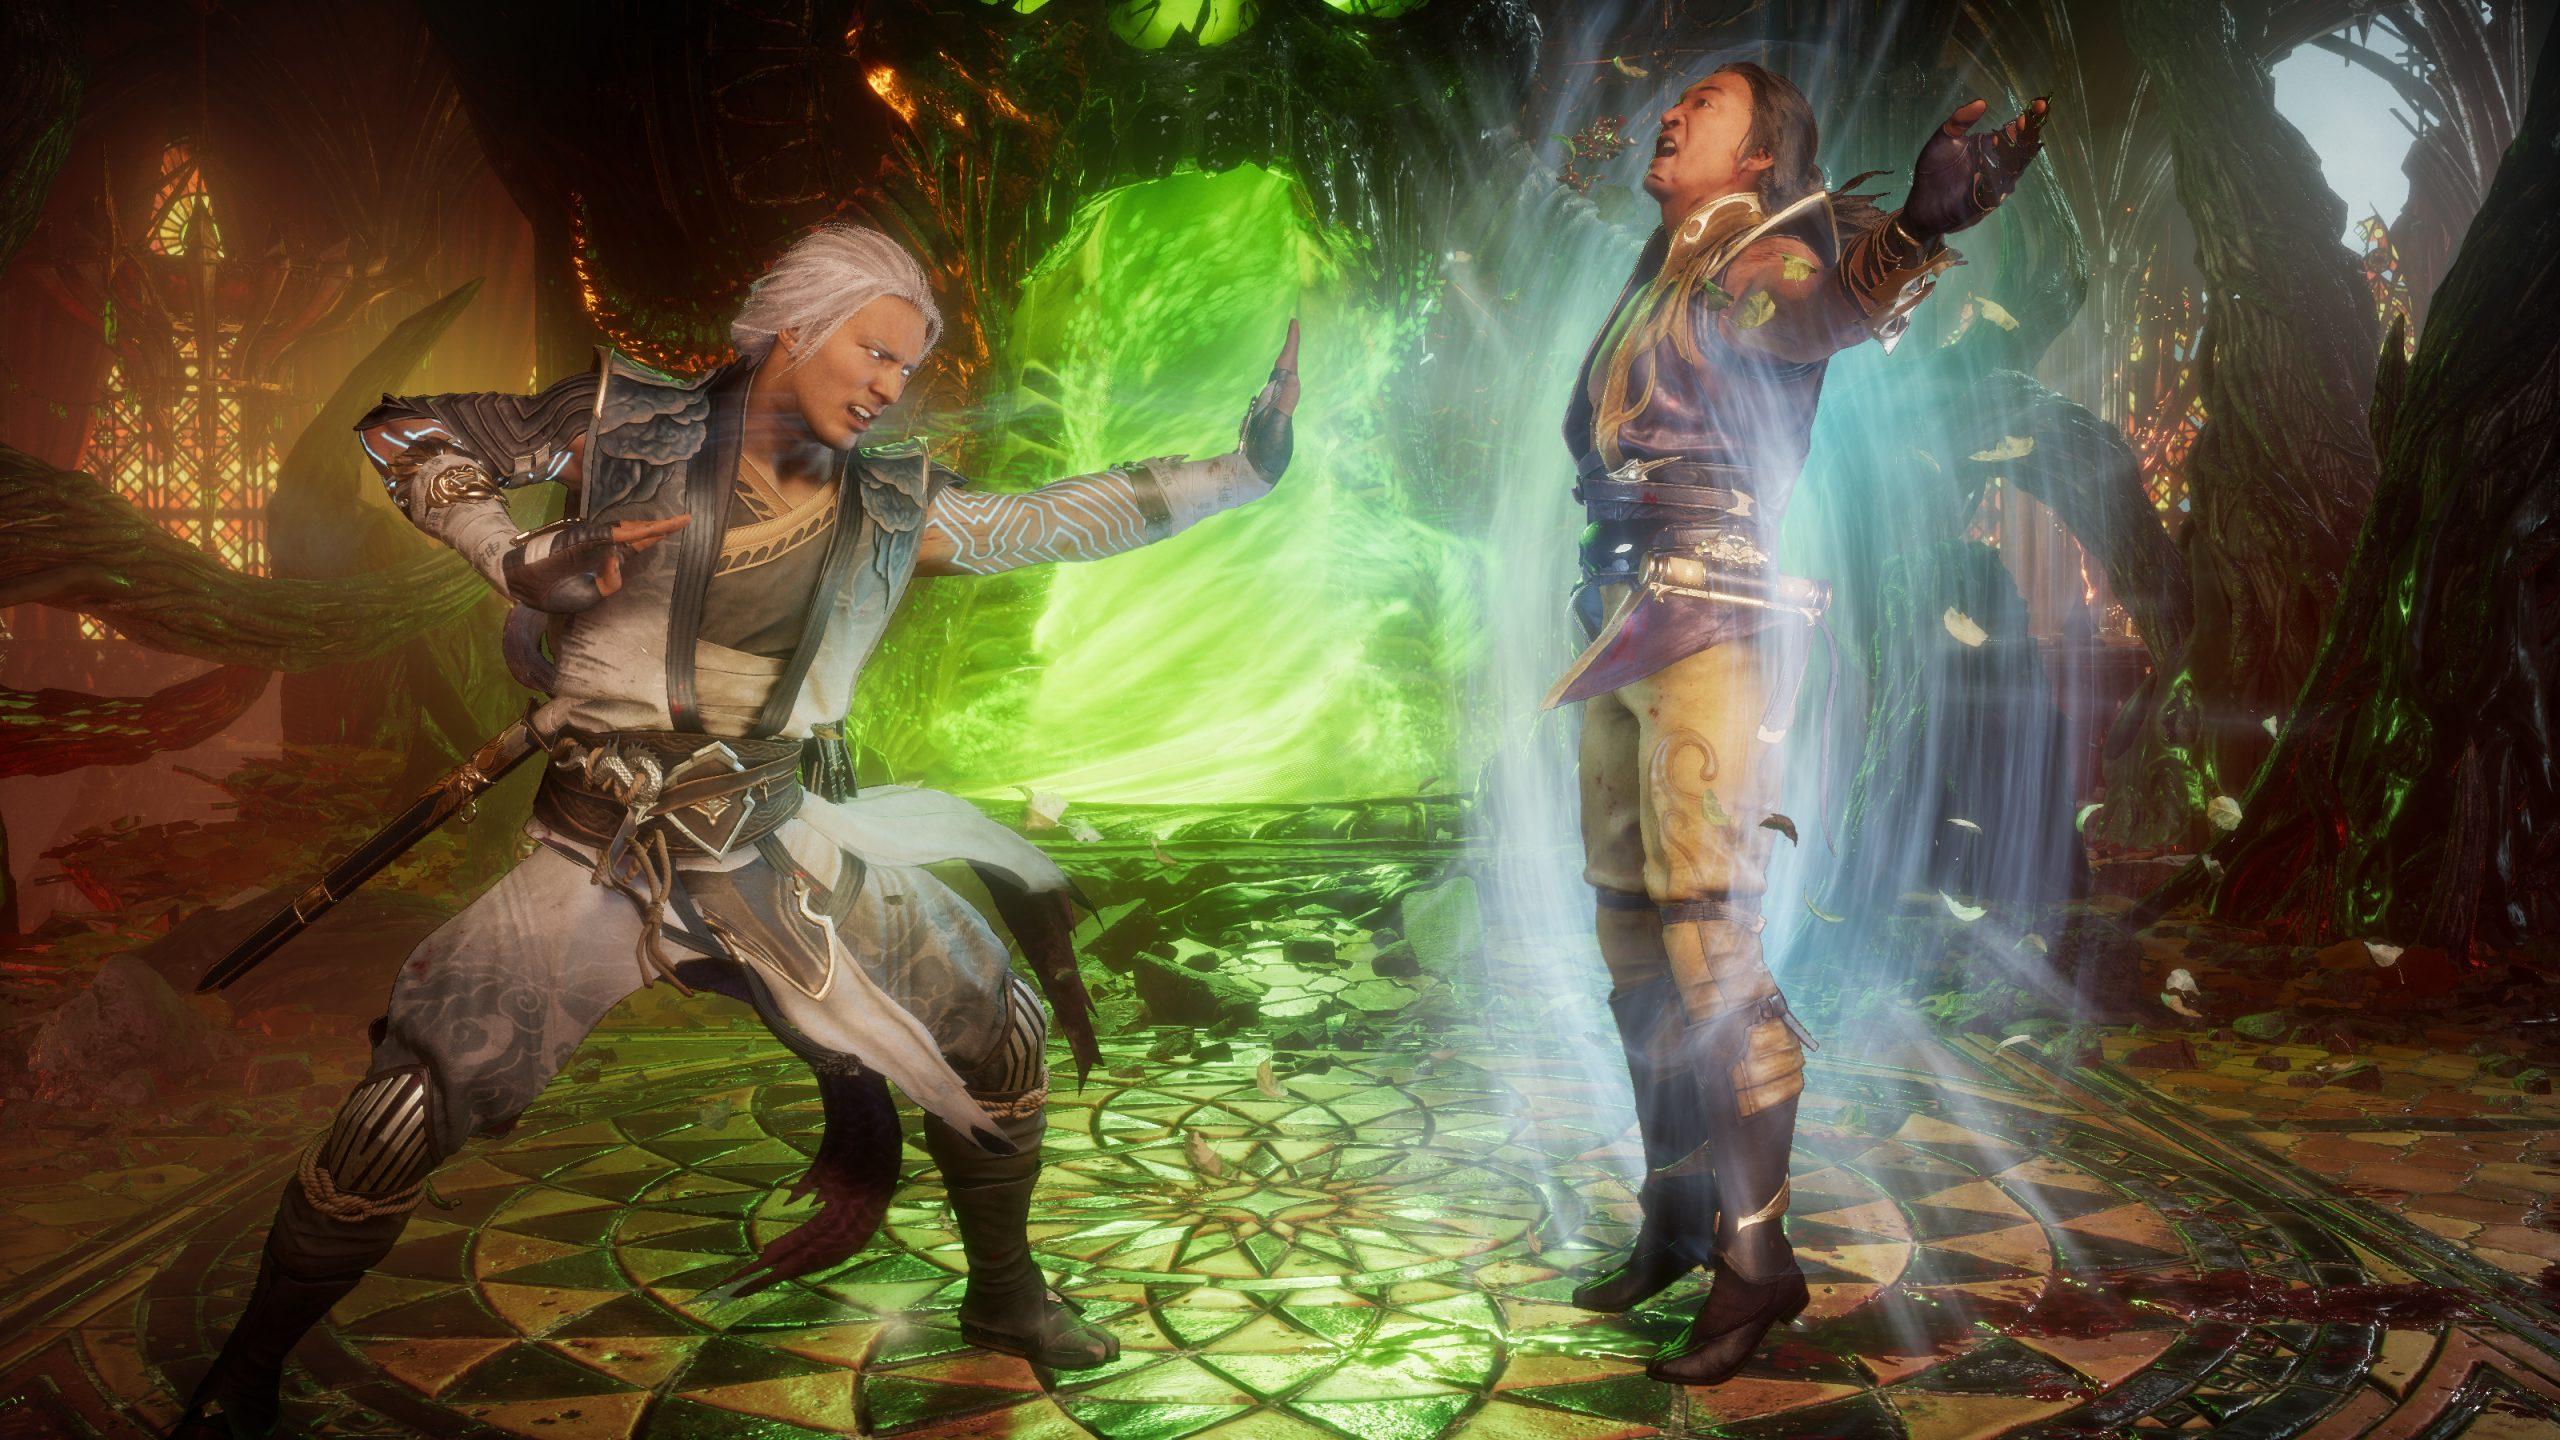 Mortal Kombat 11 After Expansion DLC